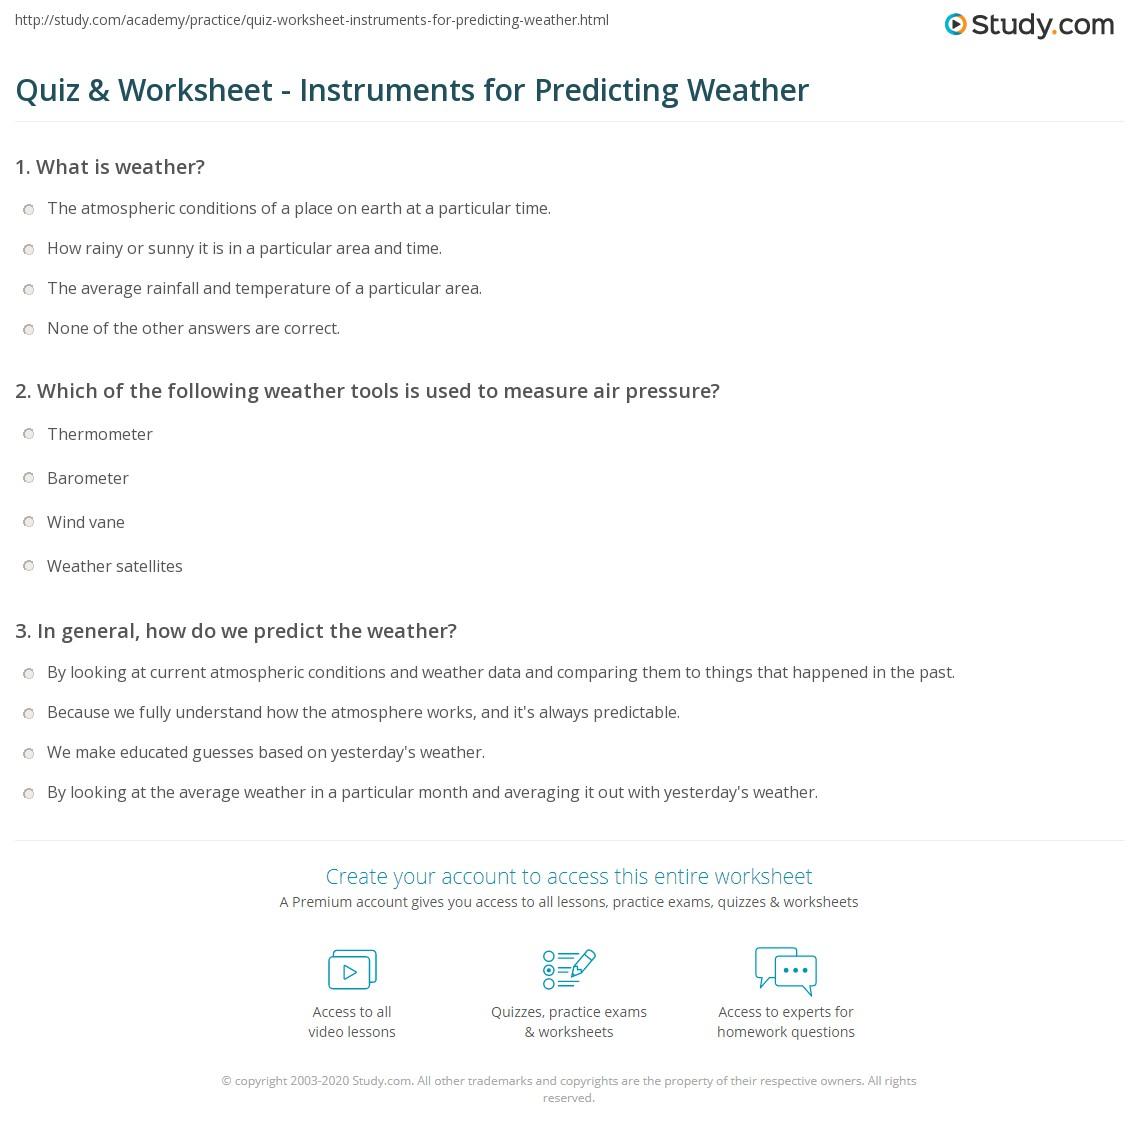 Worksheets Weather Tools Worksheet quiz worksheet instruments for predicting weather study com print the tools maps symbols worksheet